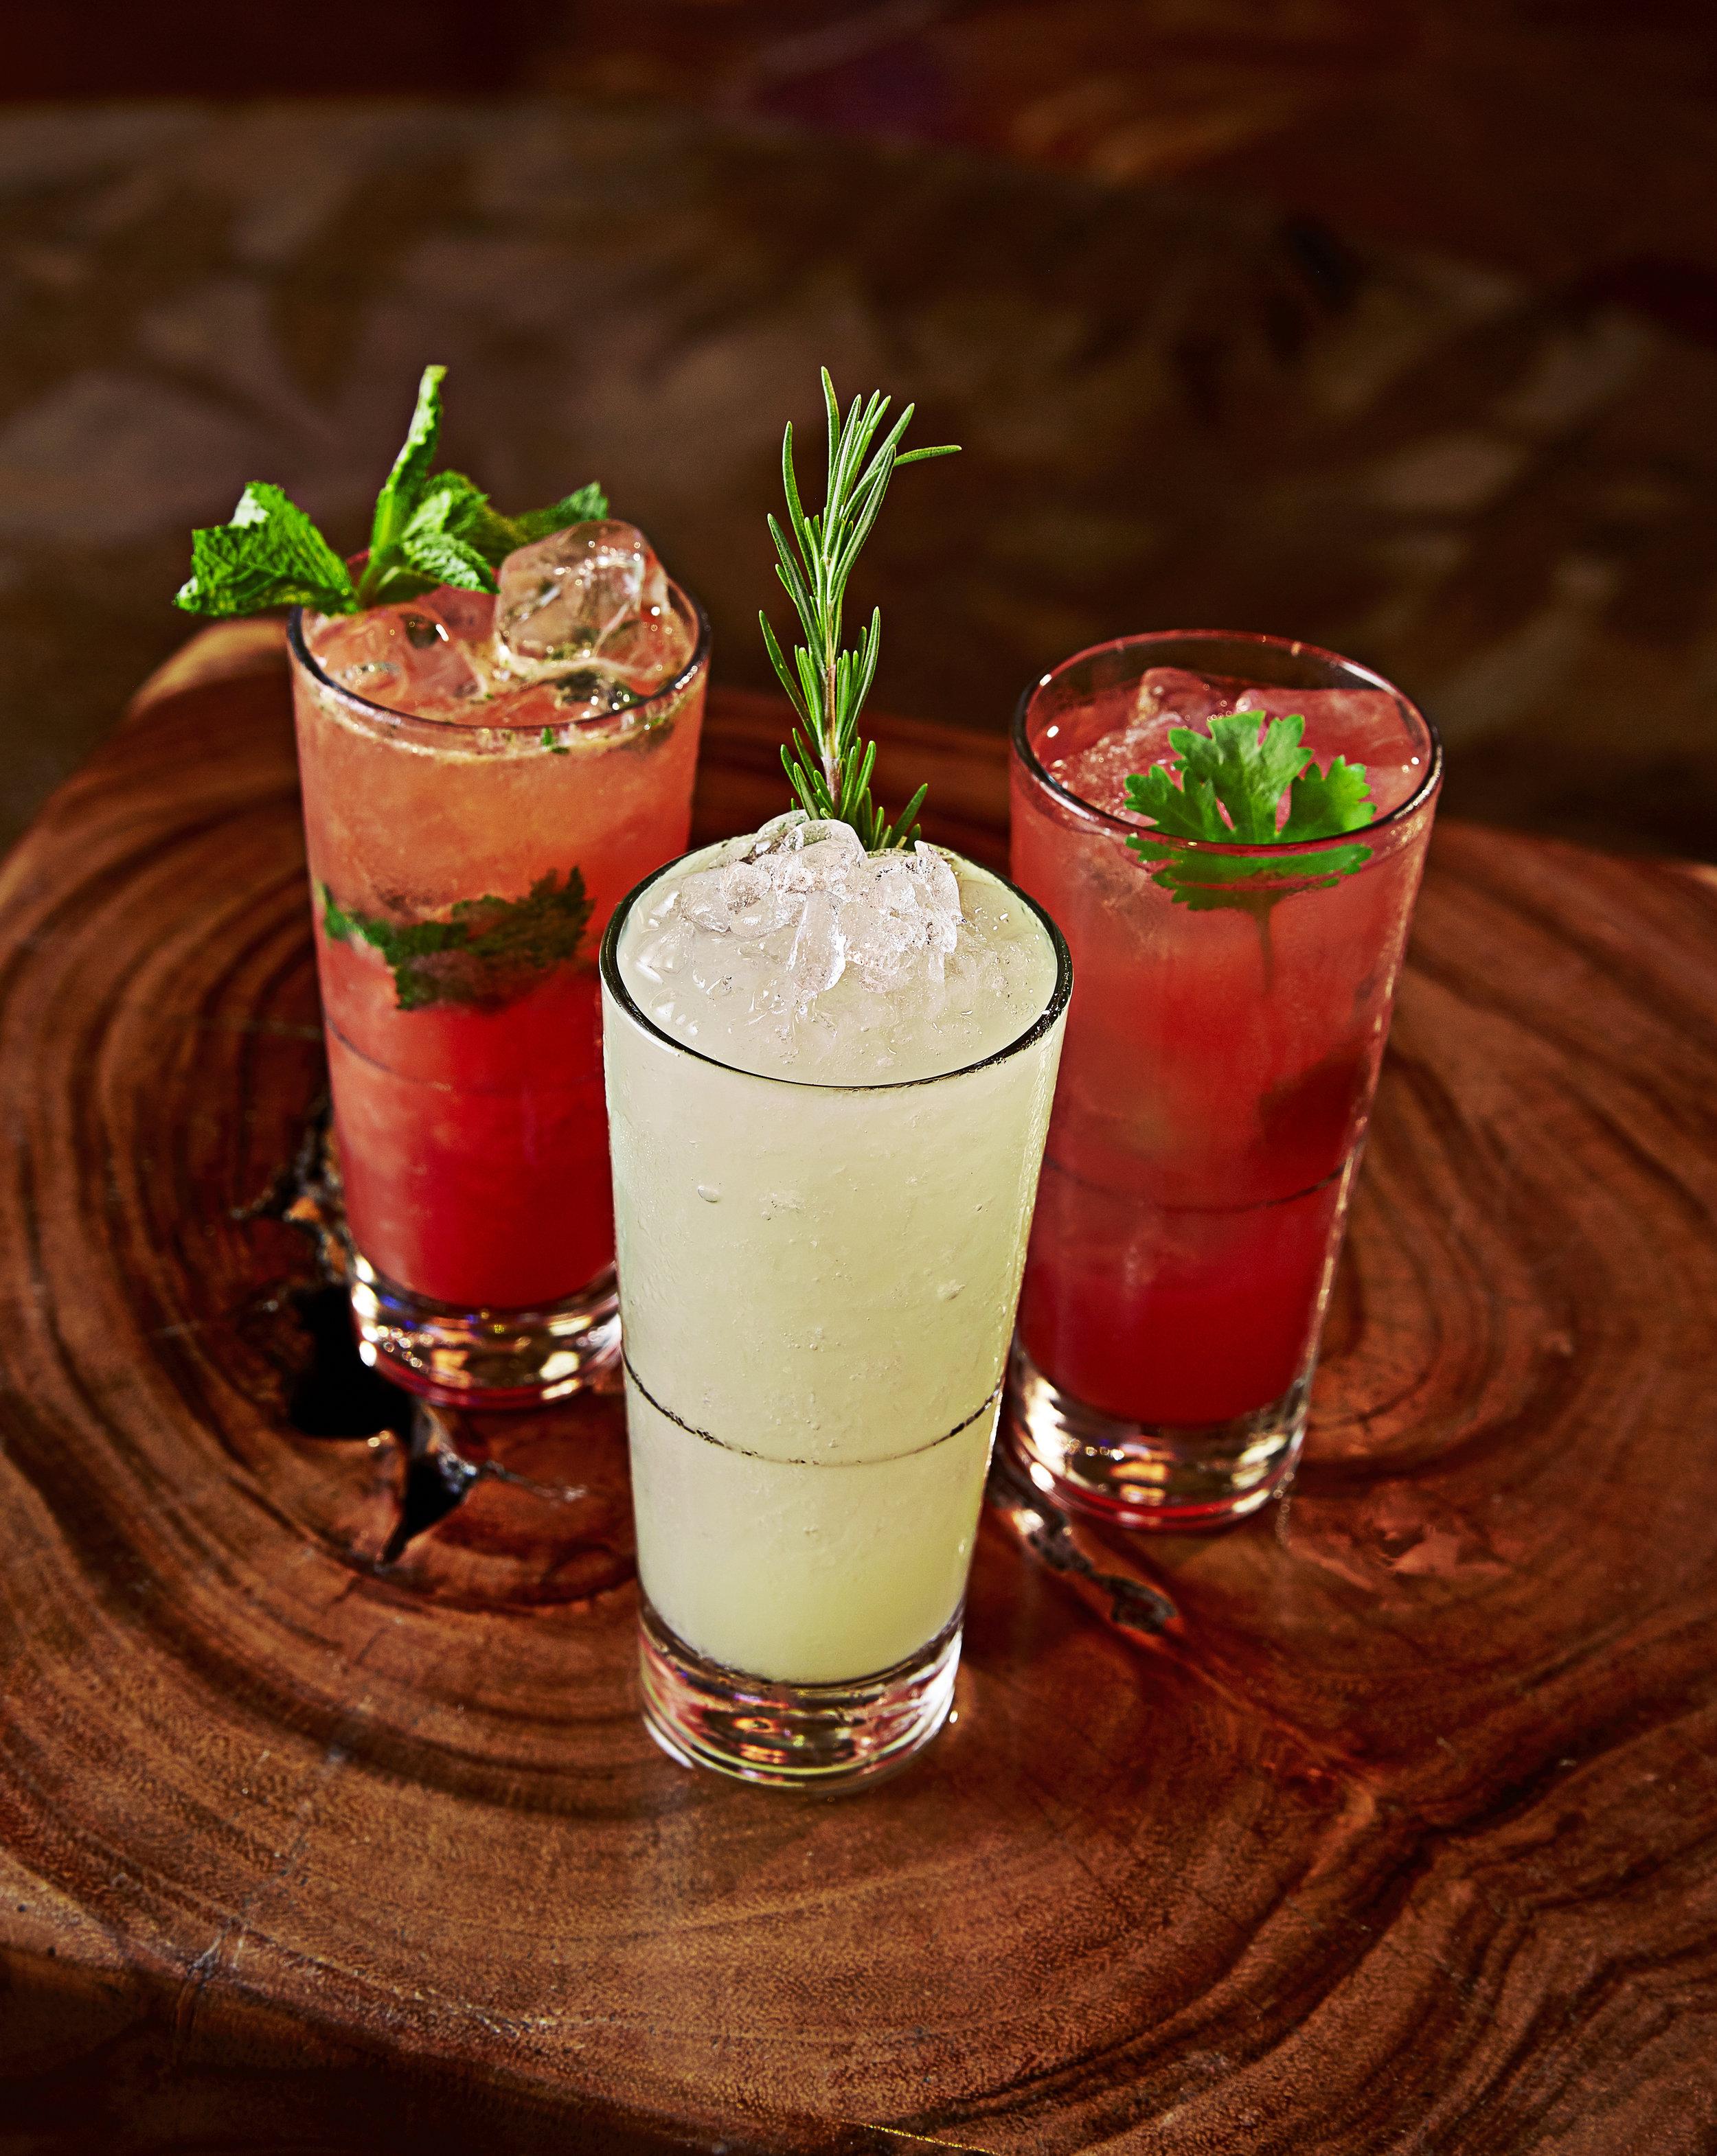 L Bar Mocktails_Blood Orange Cooler, Grape Rosemary Smash, Watermelon Cilantro Fresca, (2).jpg